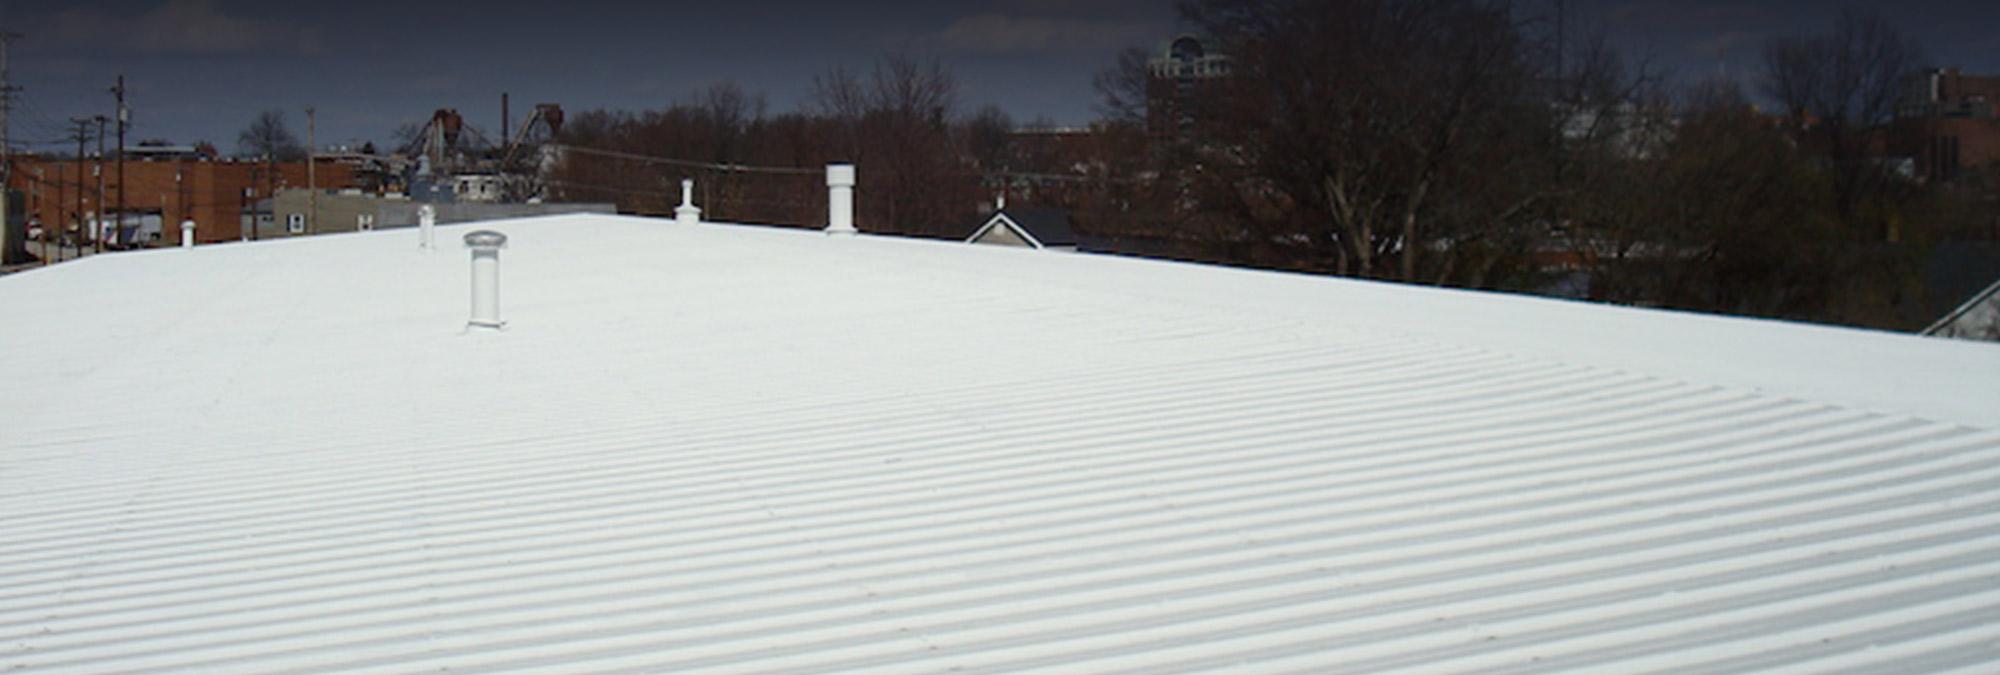 Fluid Applied Roofing & Coatings